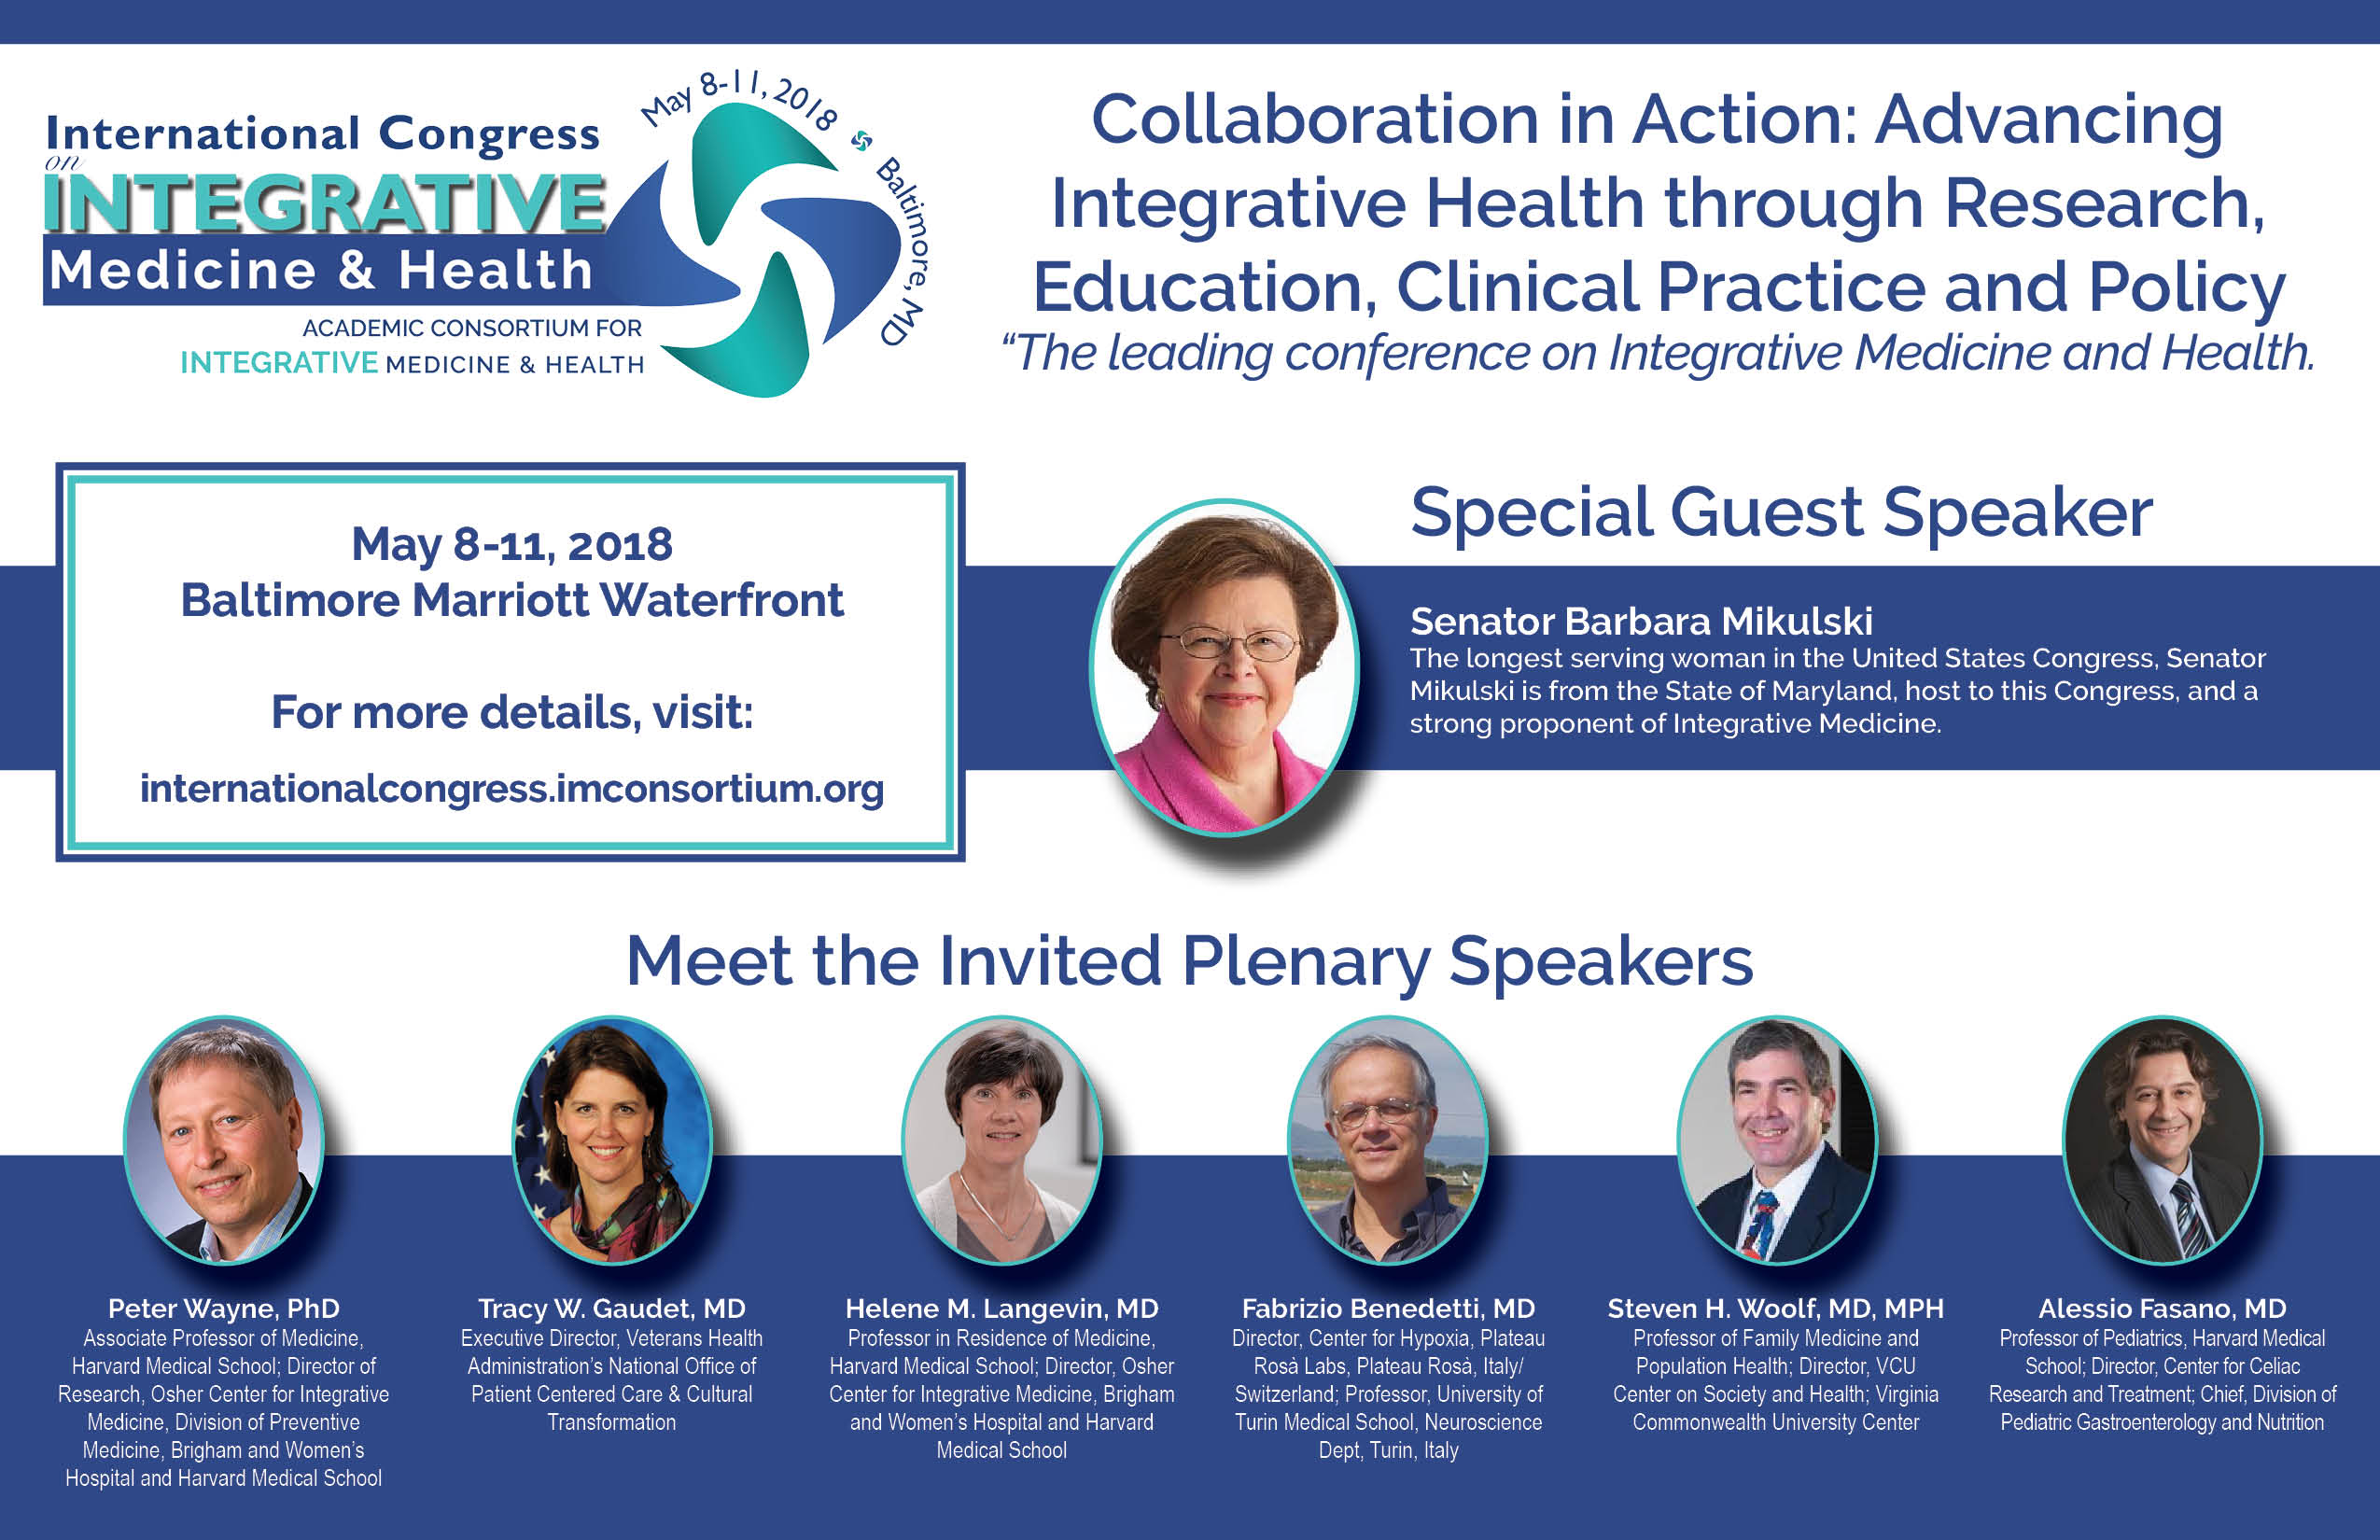 2018 International Congress on Integrative Medicine & Health